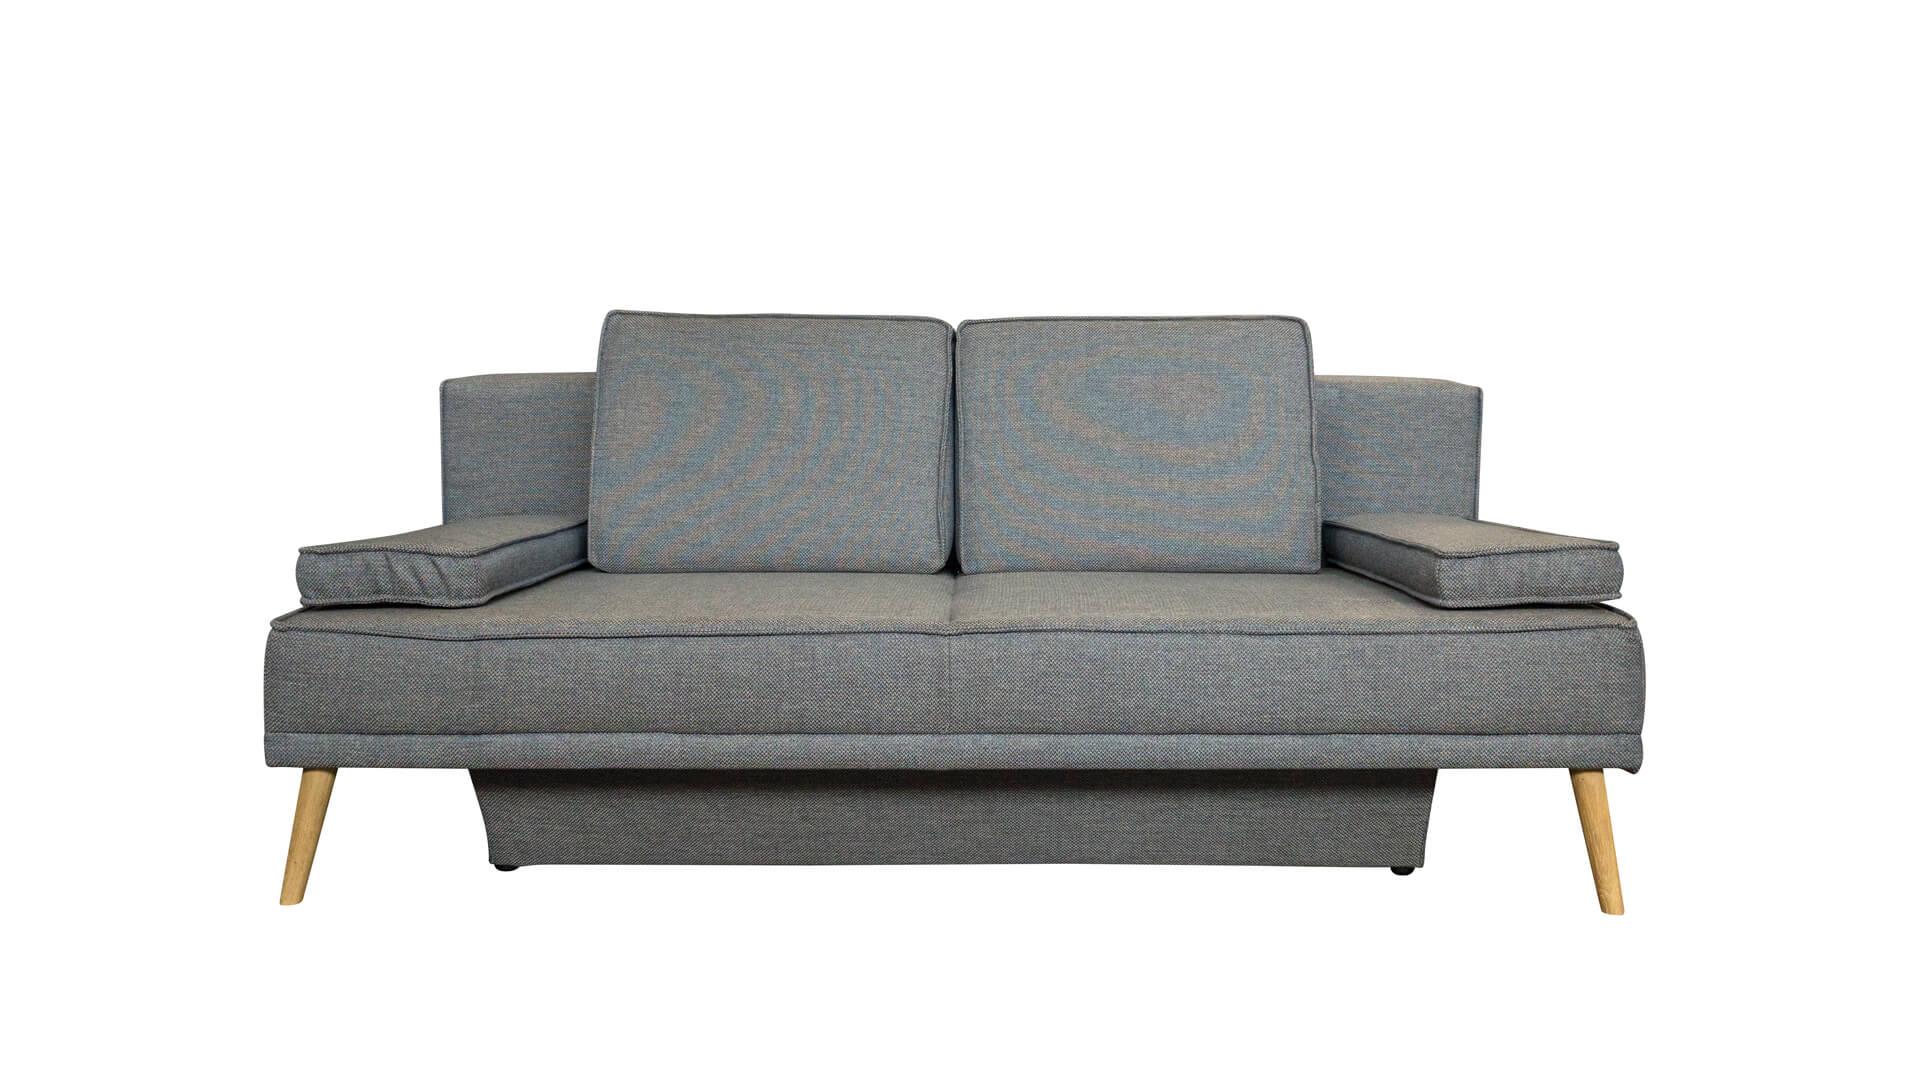 schlafsofa preiswert elegant fredriks schlafsofa faith. Black Bedroom Furniture Sets. Home Design Ideas